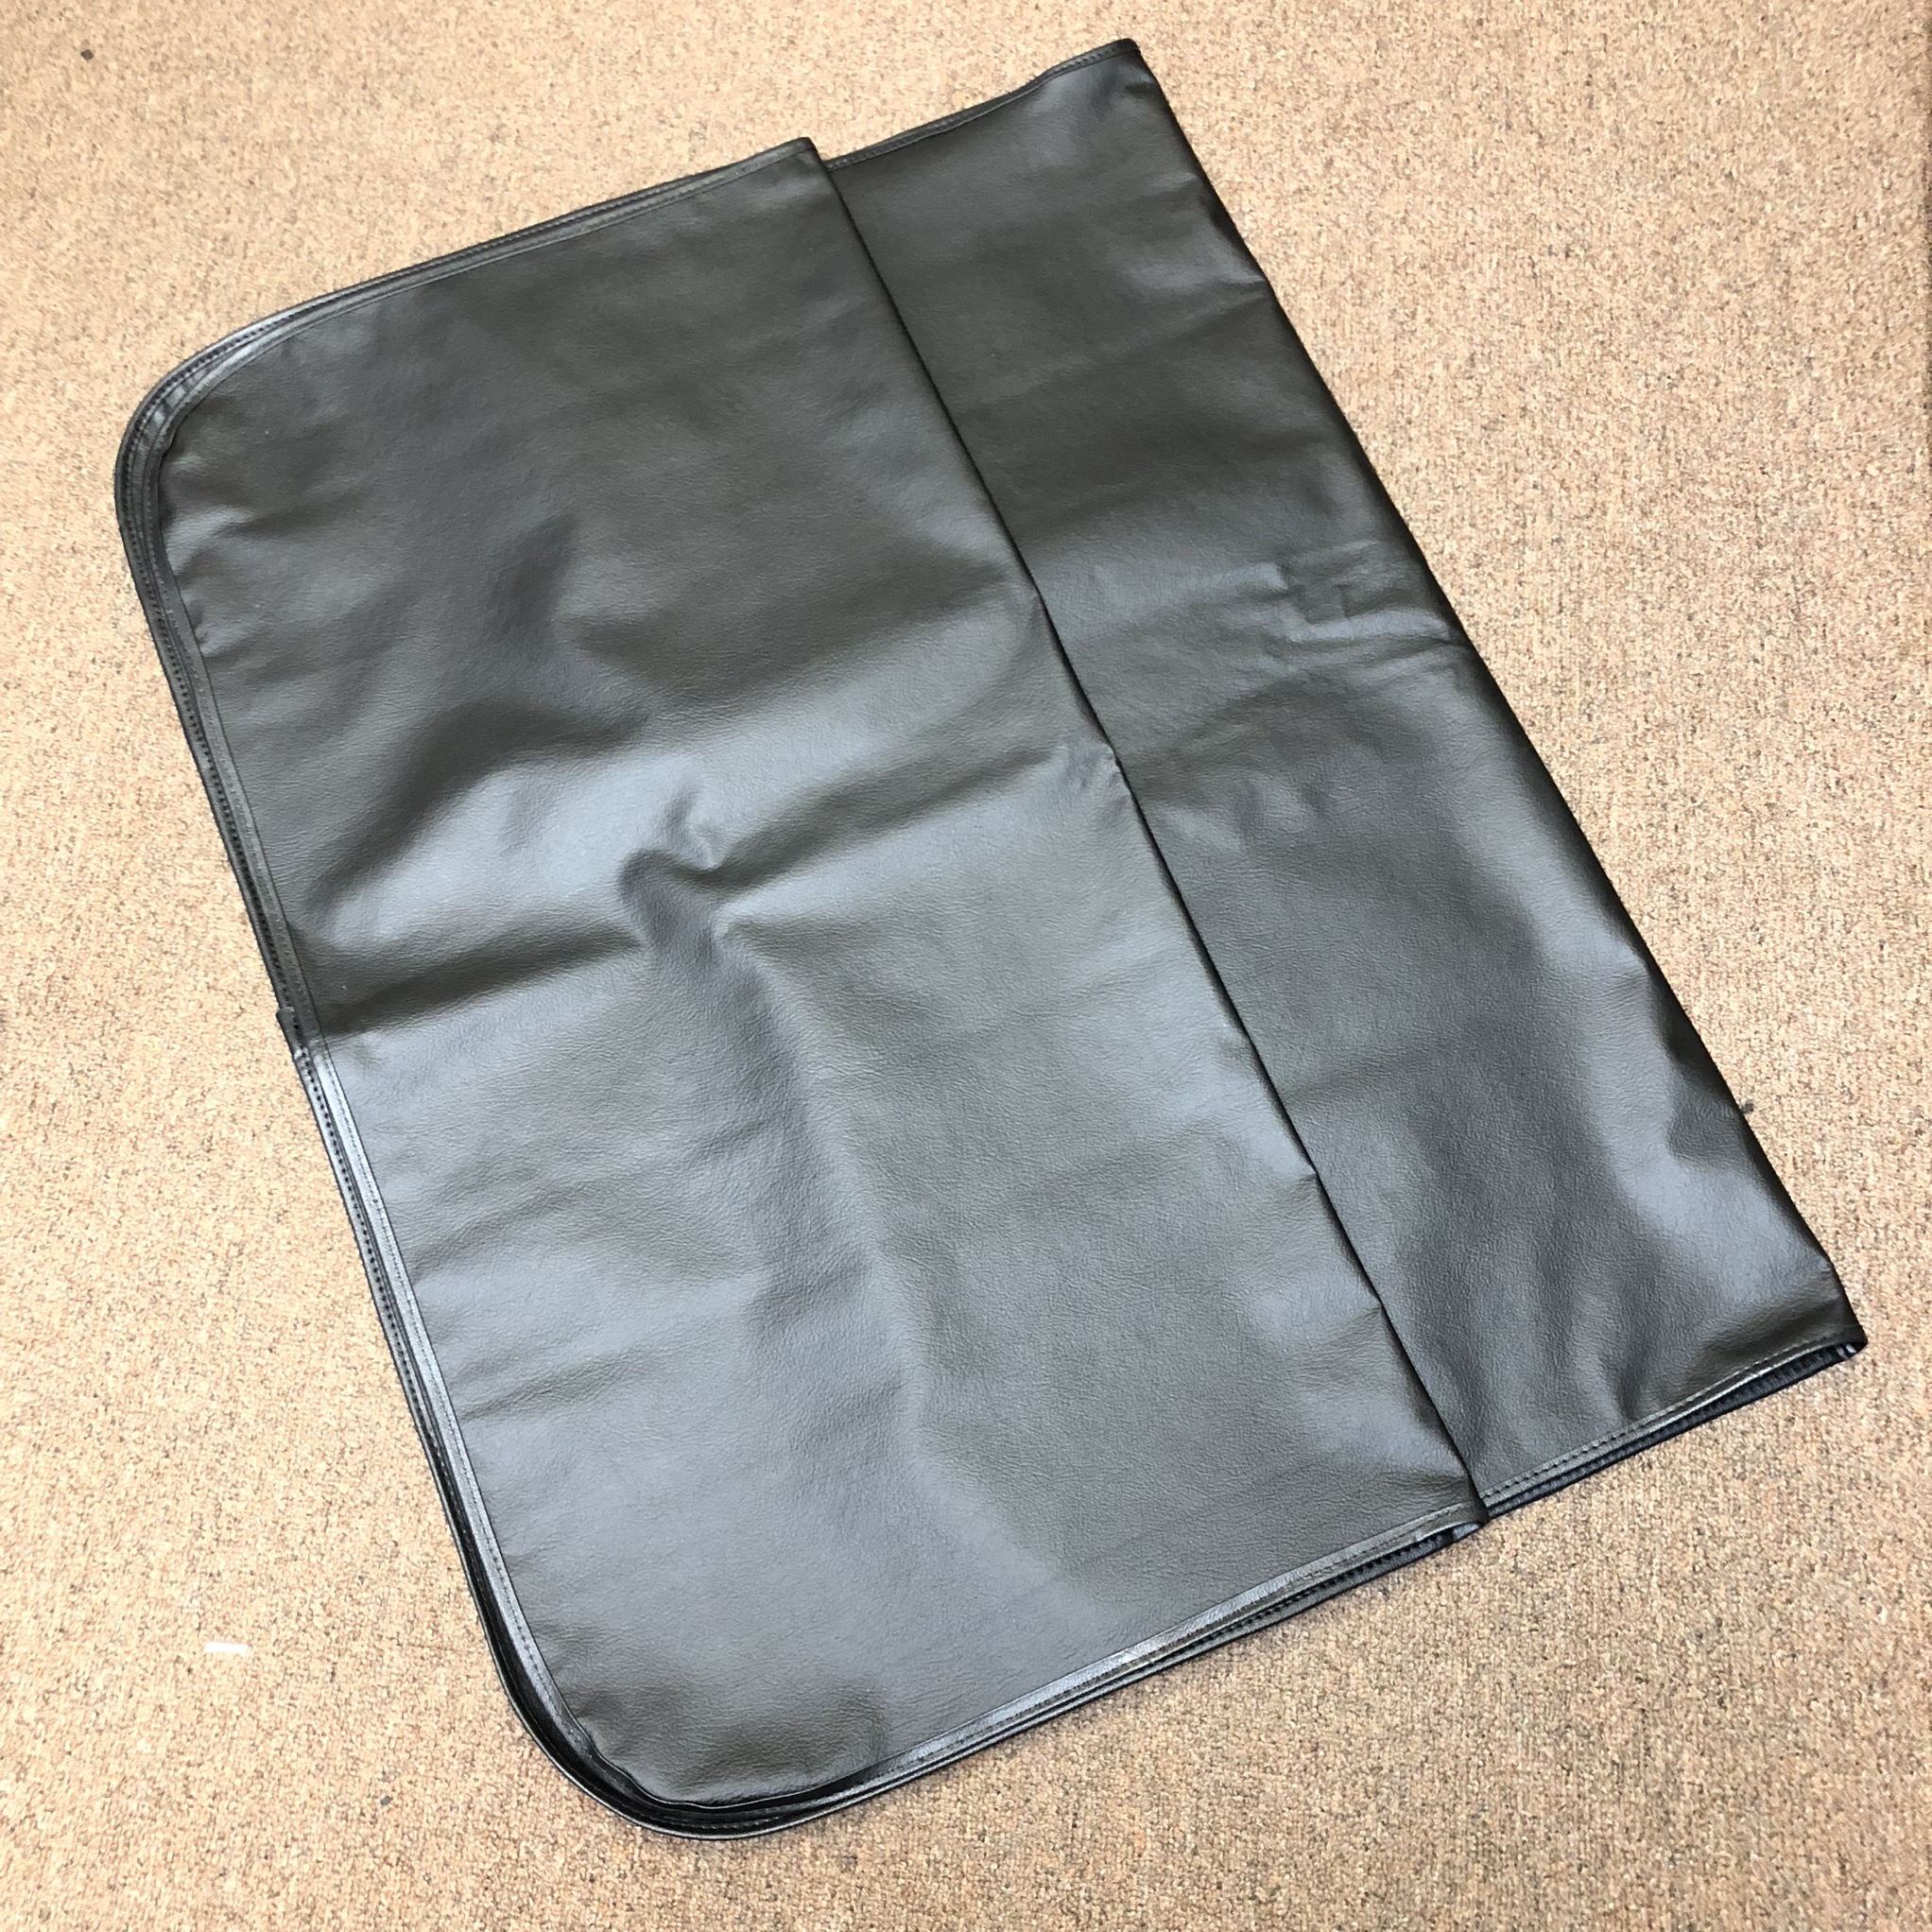 76-81 FIREBIRD CAMARO T-TOP STORAGE BAGS BLACK ( Hurst or Fisher )